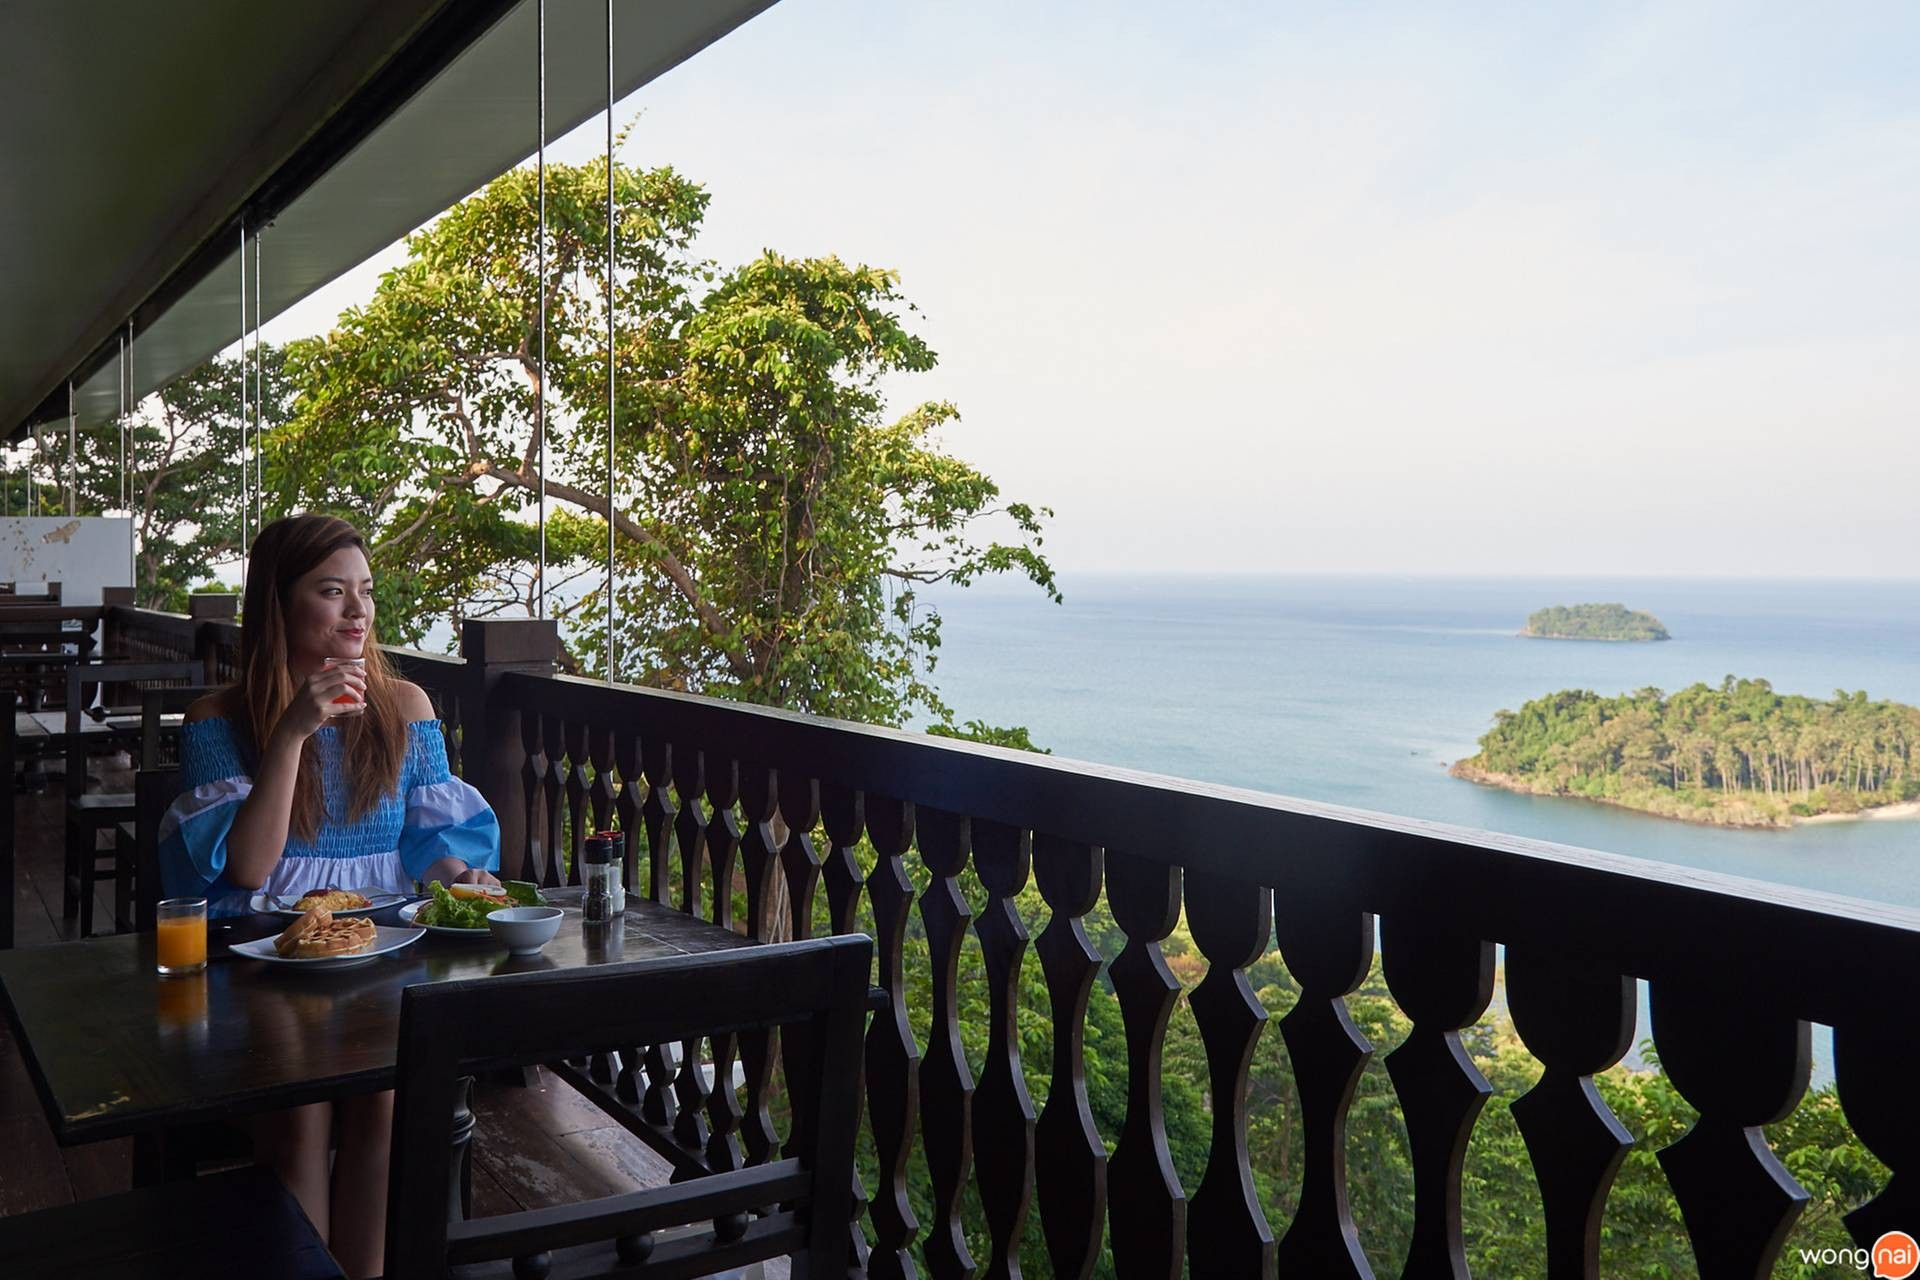 Sea View Koh Chang (ซีวิว เกาะช้าง)